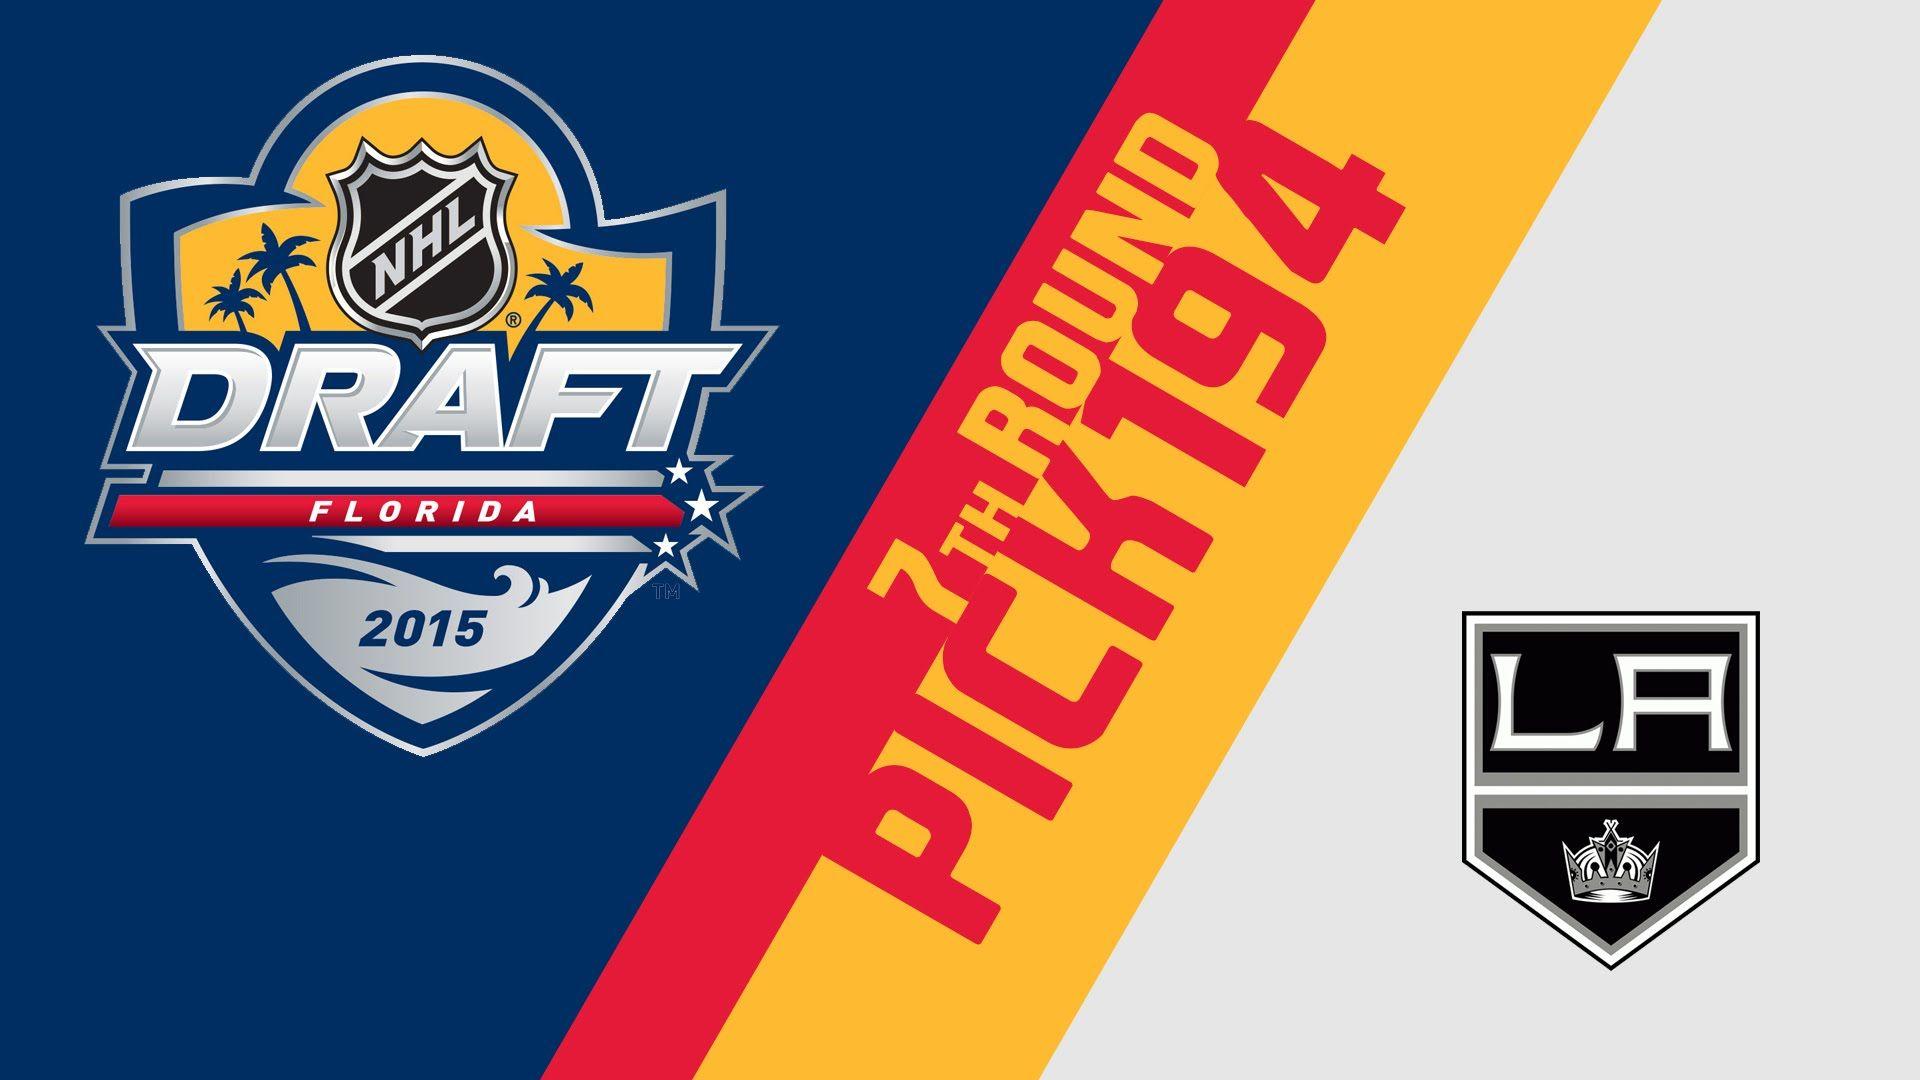 Matt Schmalz Drafted By Los Angeles Kings Nhl Draft Blues Nhl Nhl Vancouver Canucks